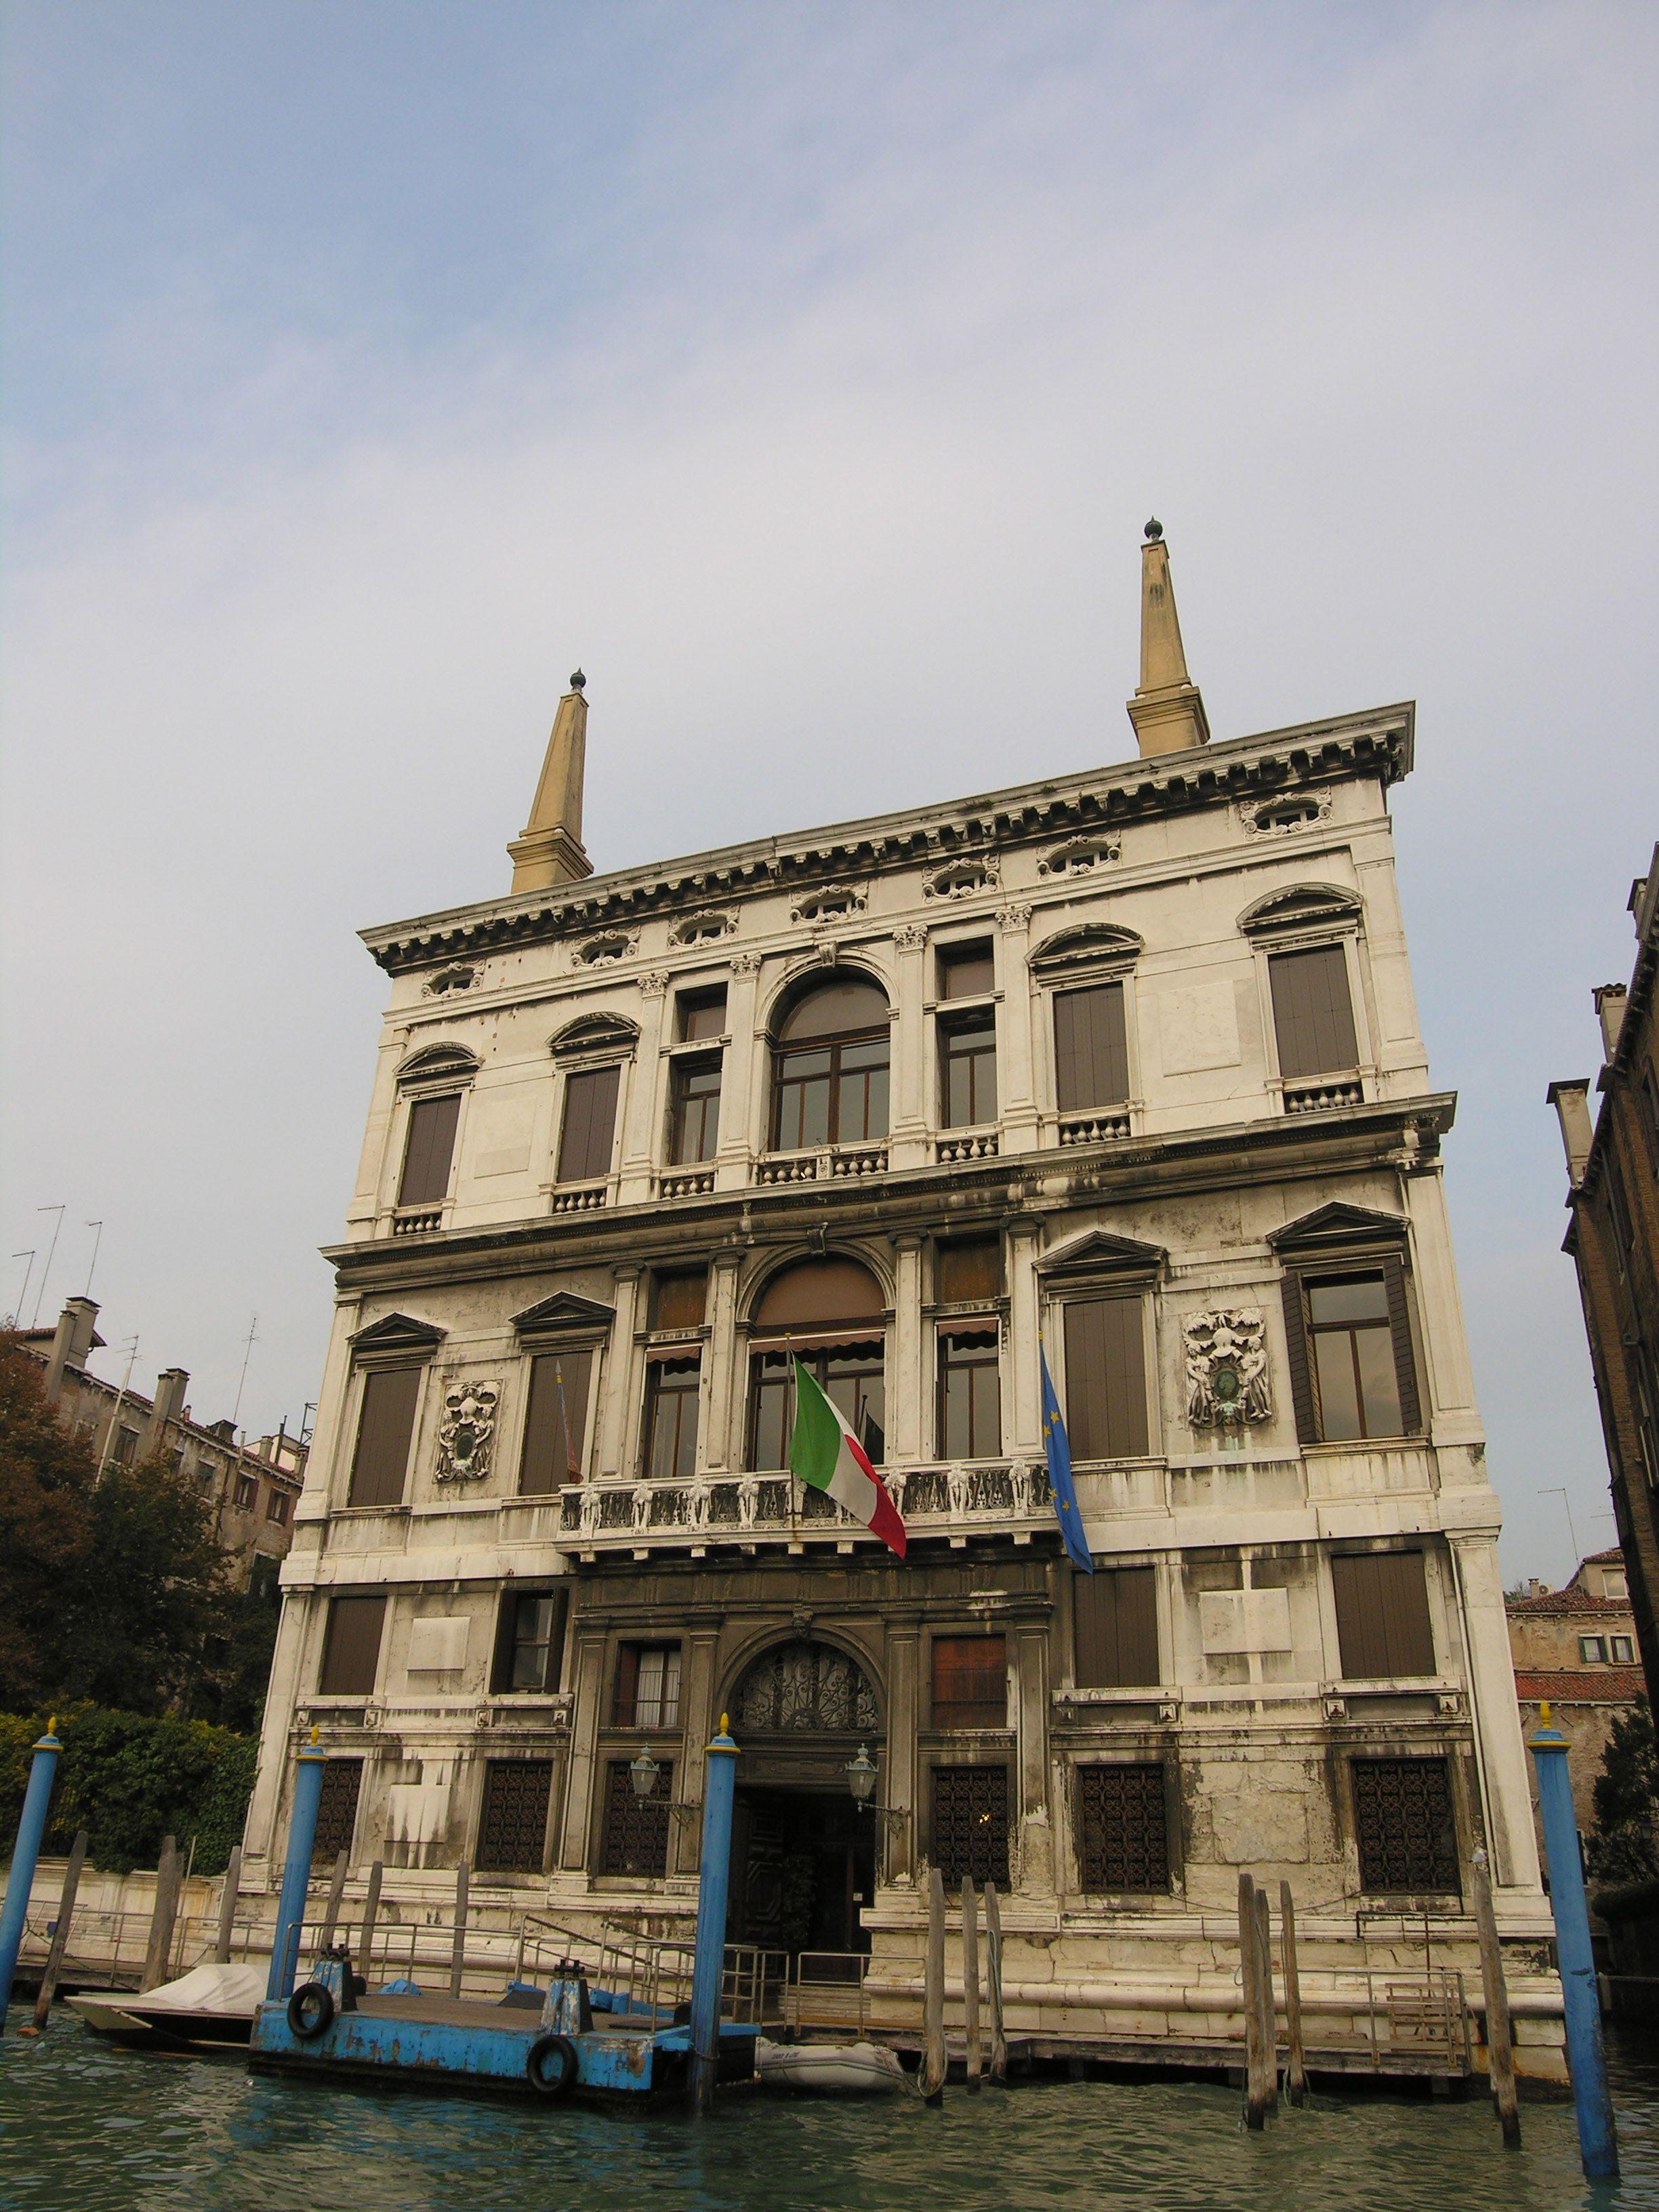 Grand Canal - Venice, Italy - Palazzo Coccina Tiepolo Papadopoli